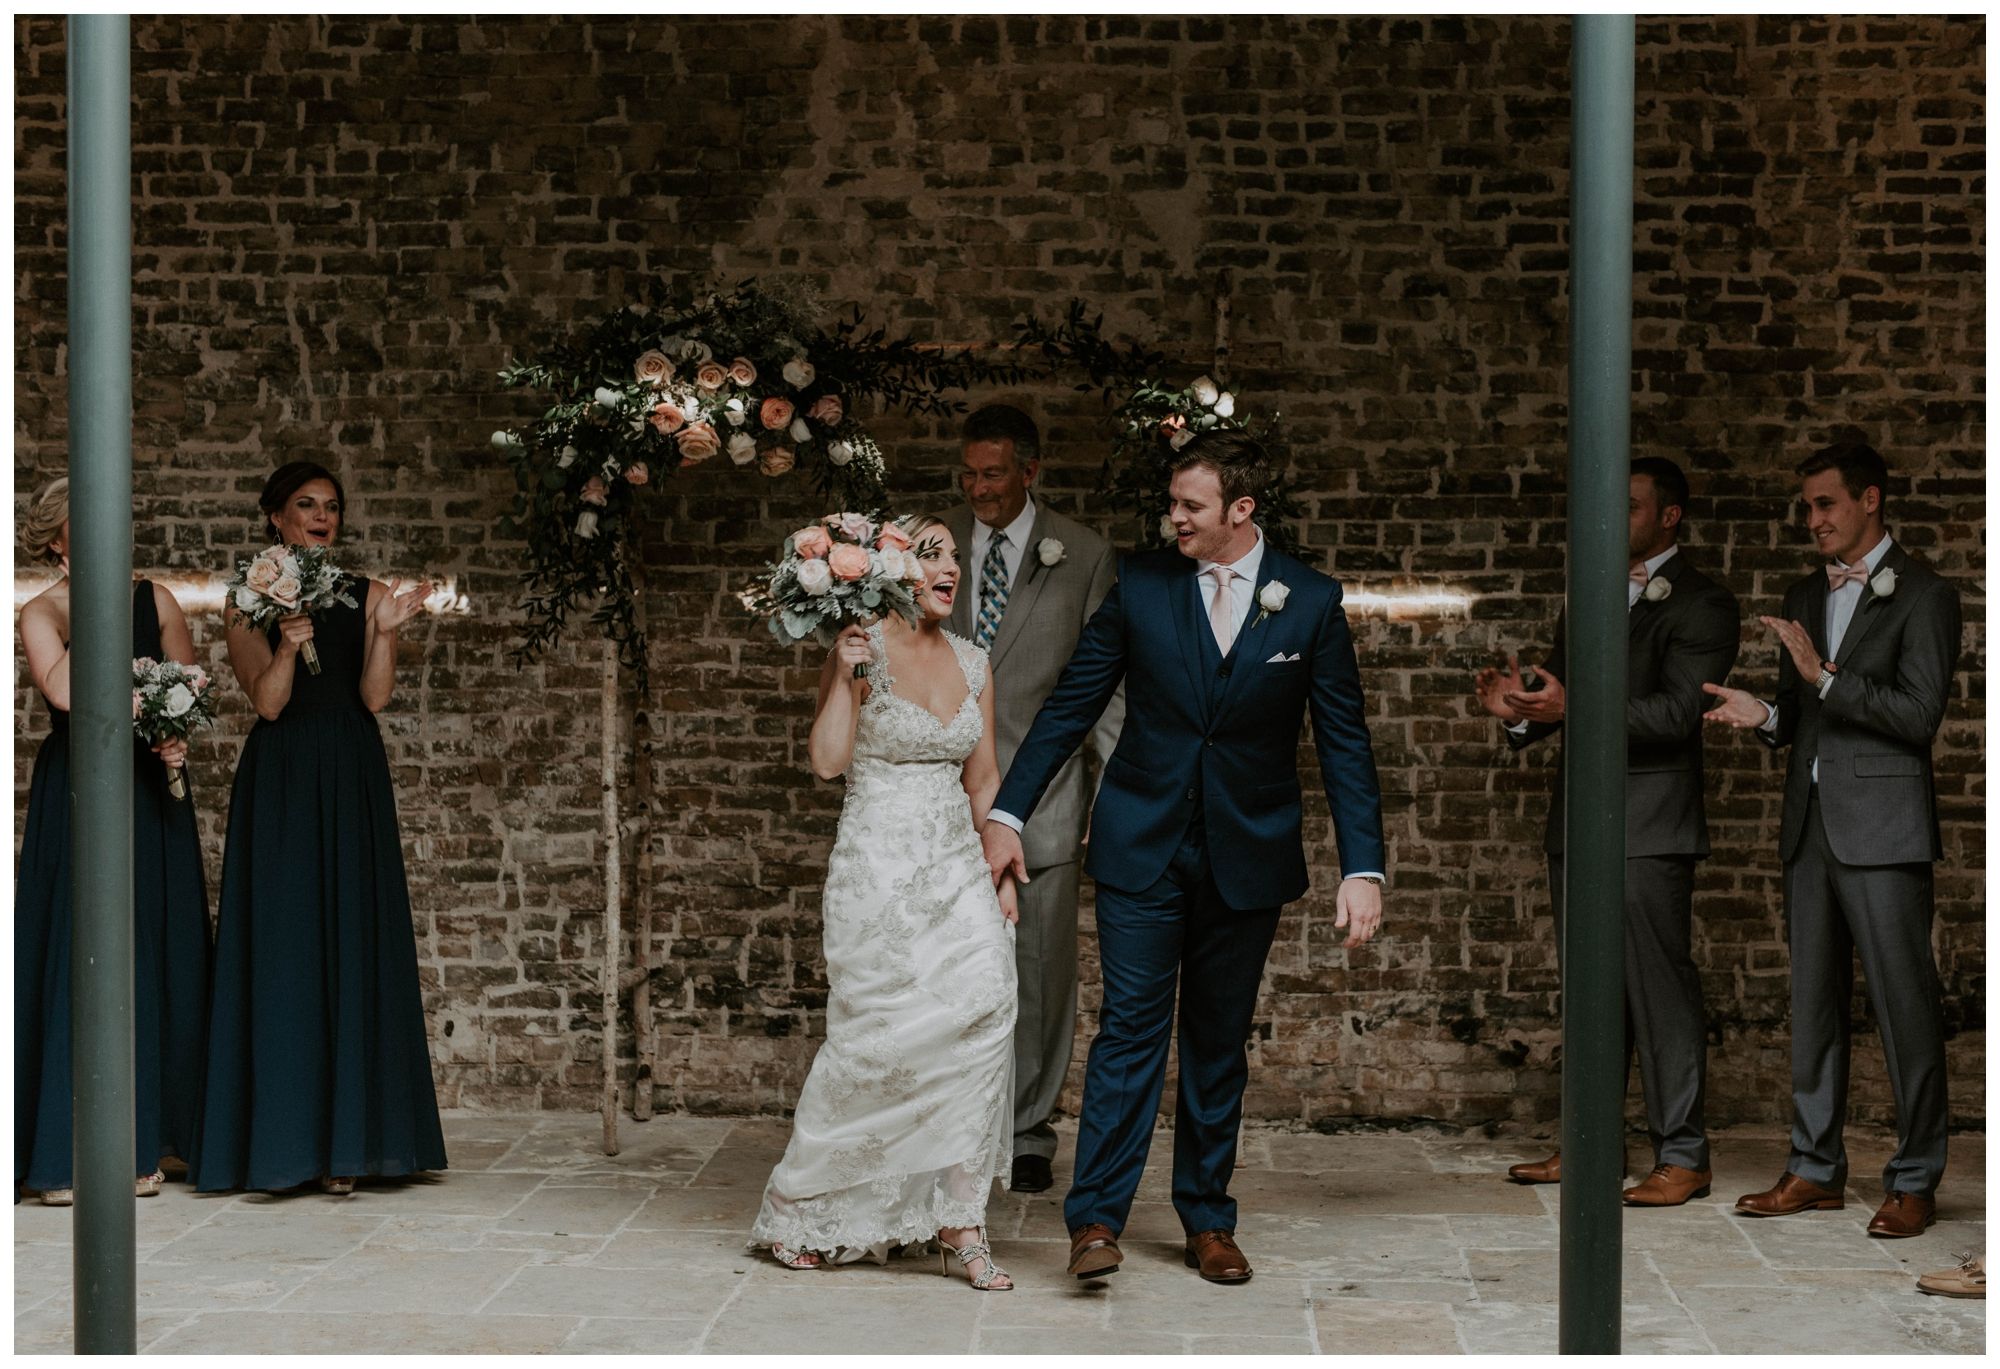 austin-texas-wedding-photography-1778-photographie_0075.jpg